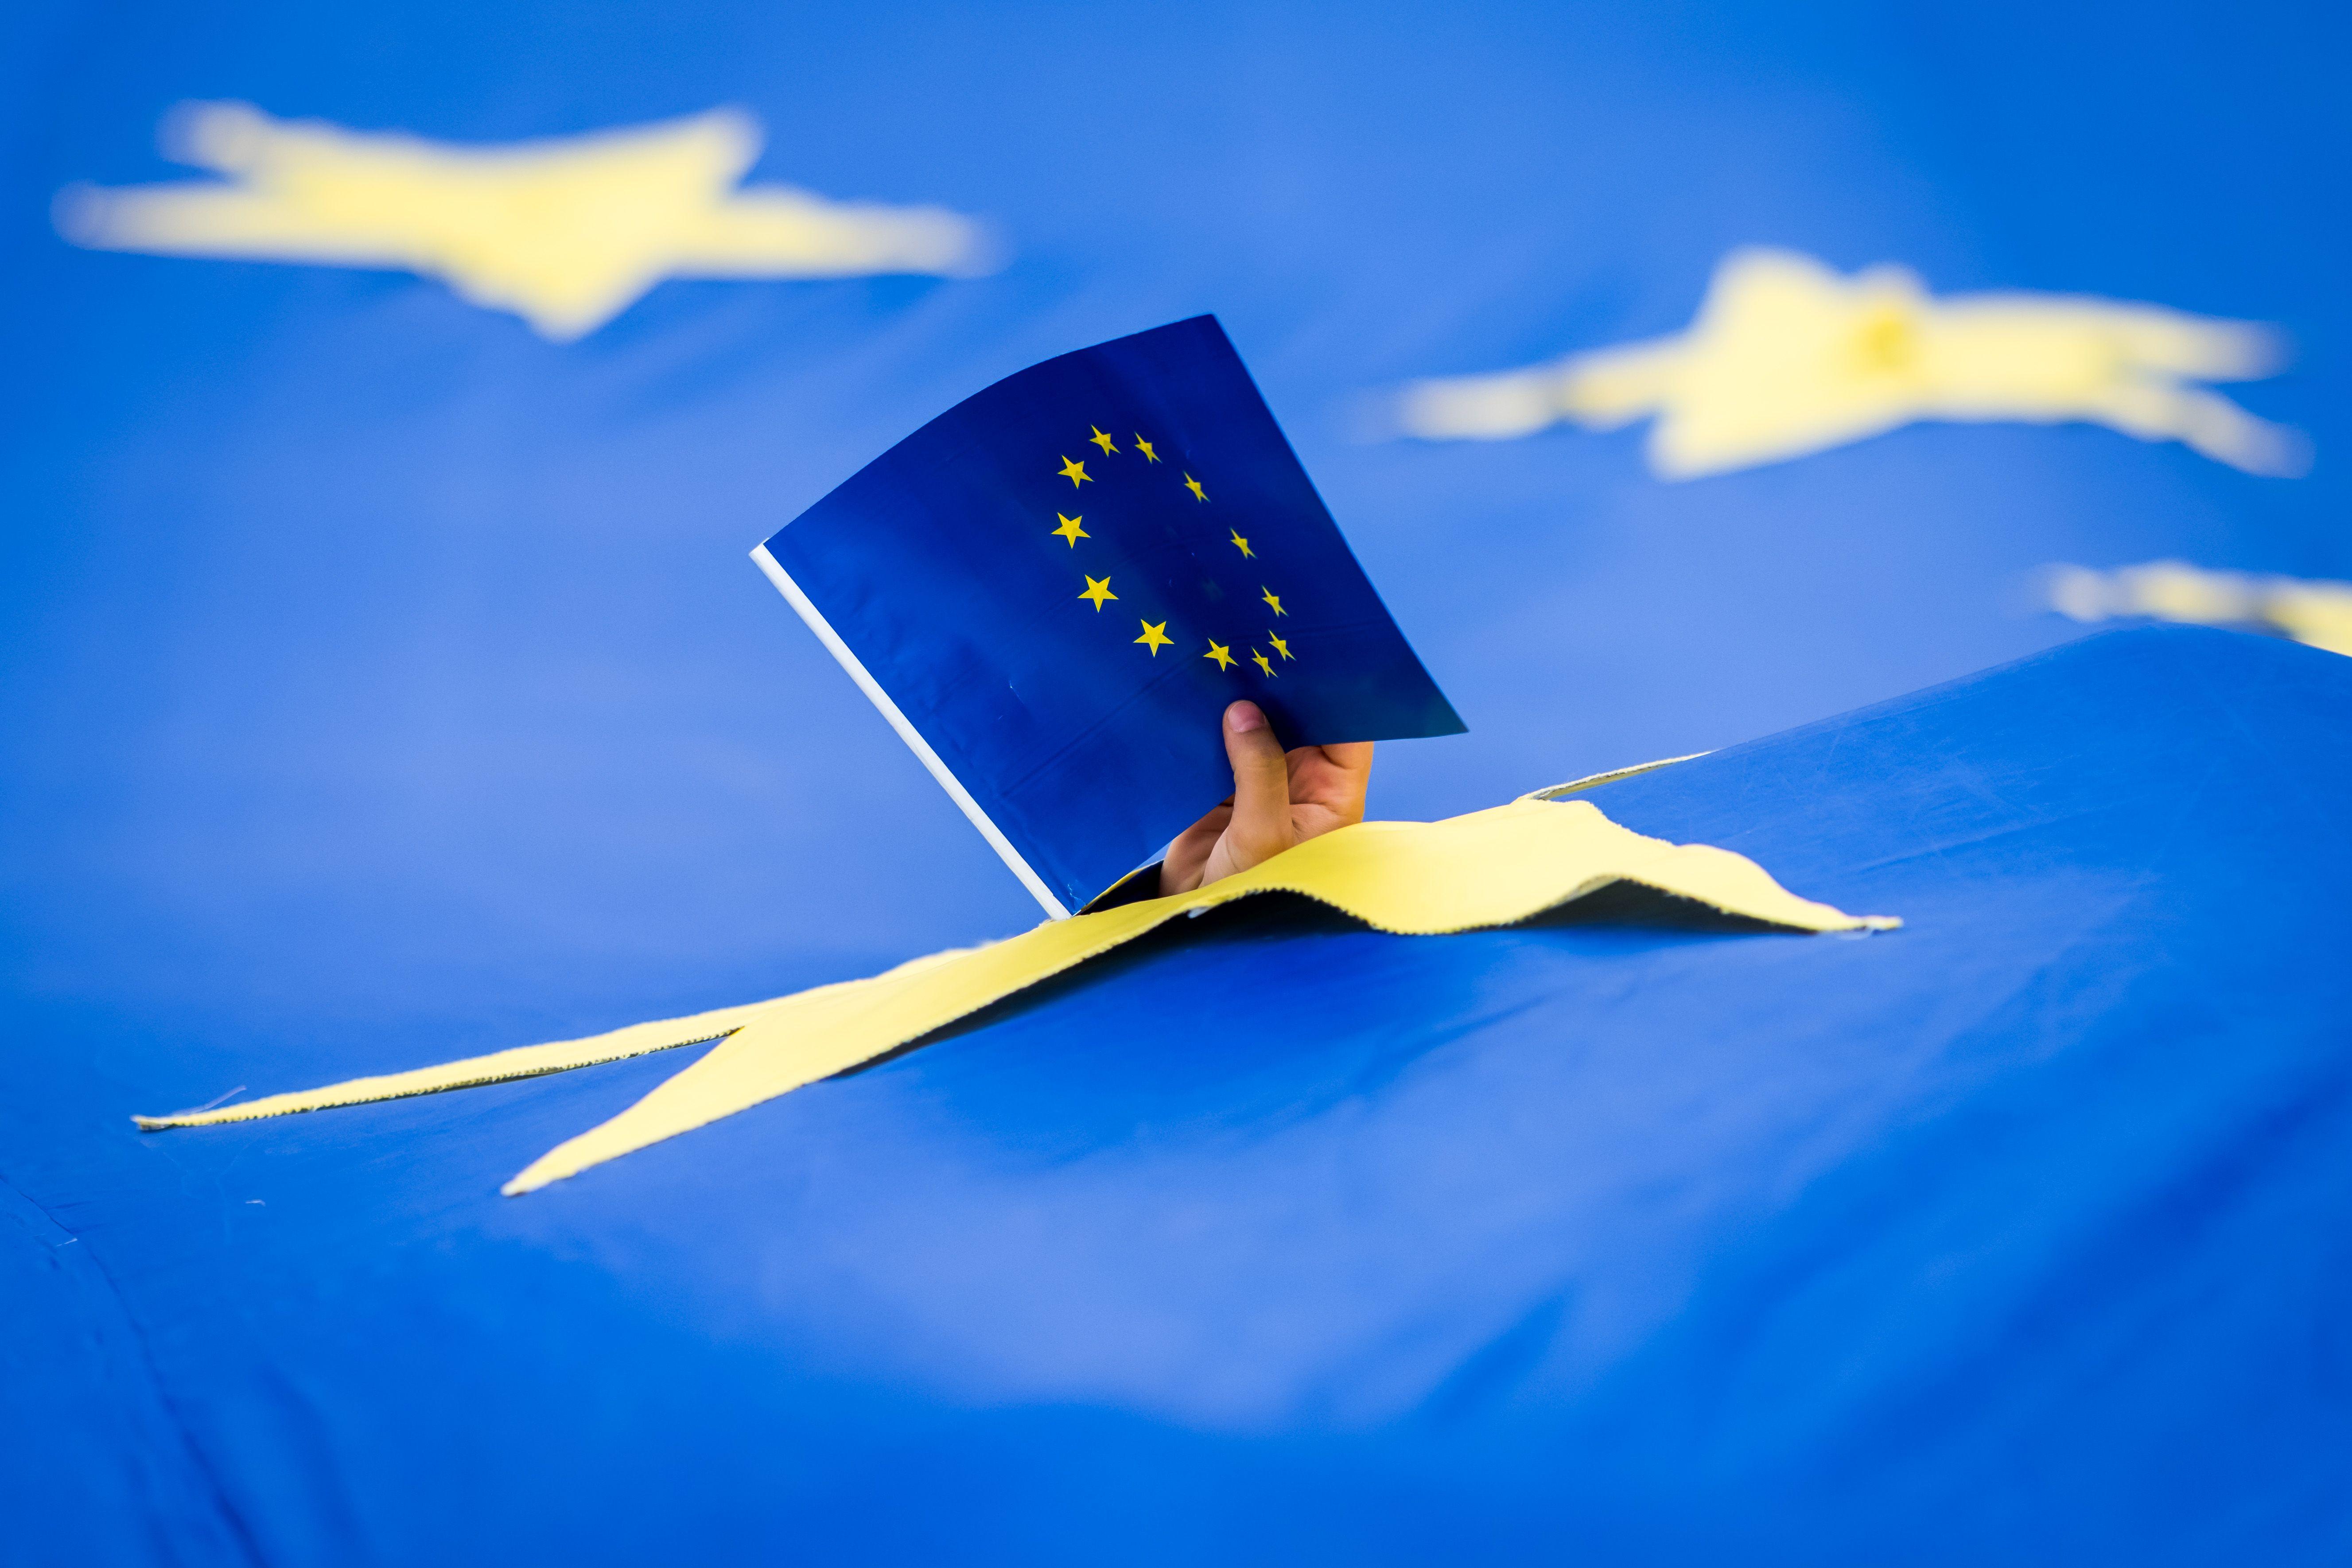 Image for Euroopa Liit: hoidkem pea külm